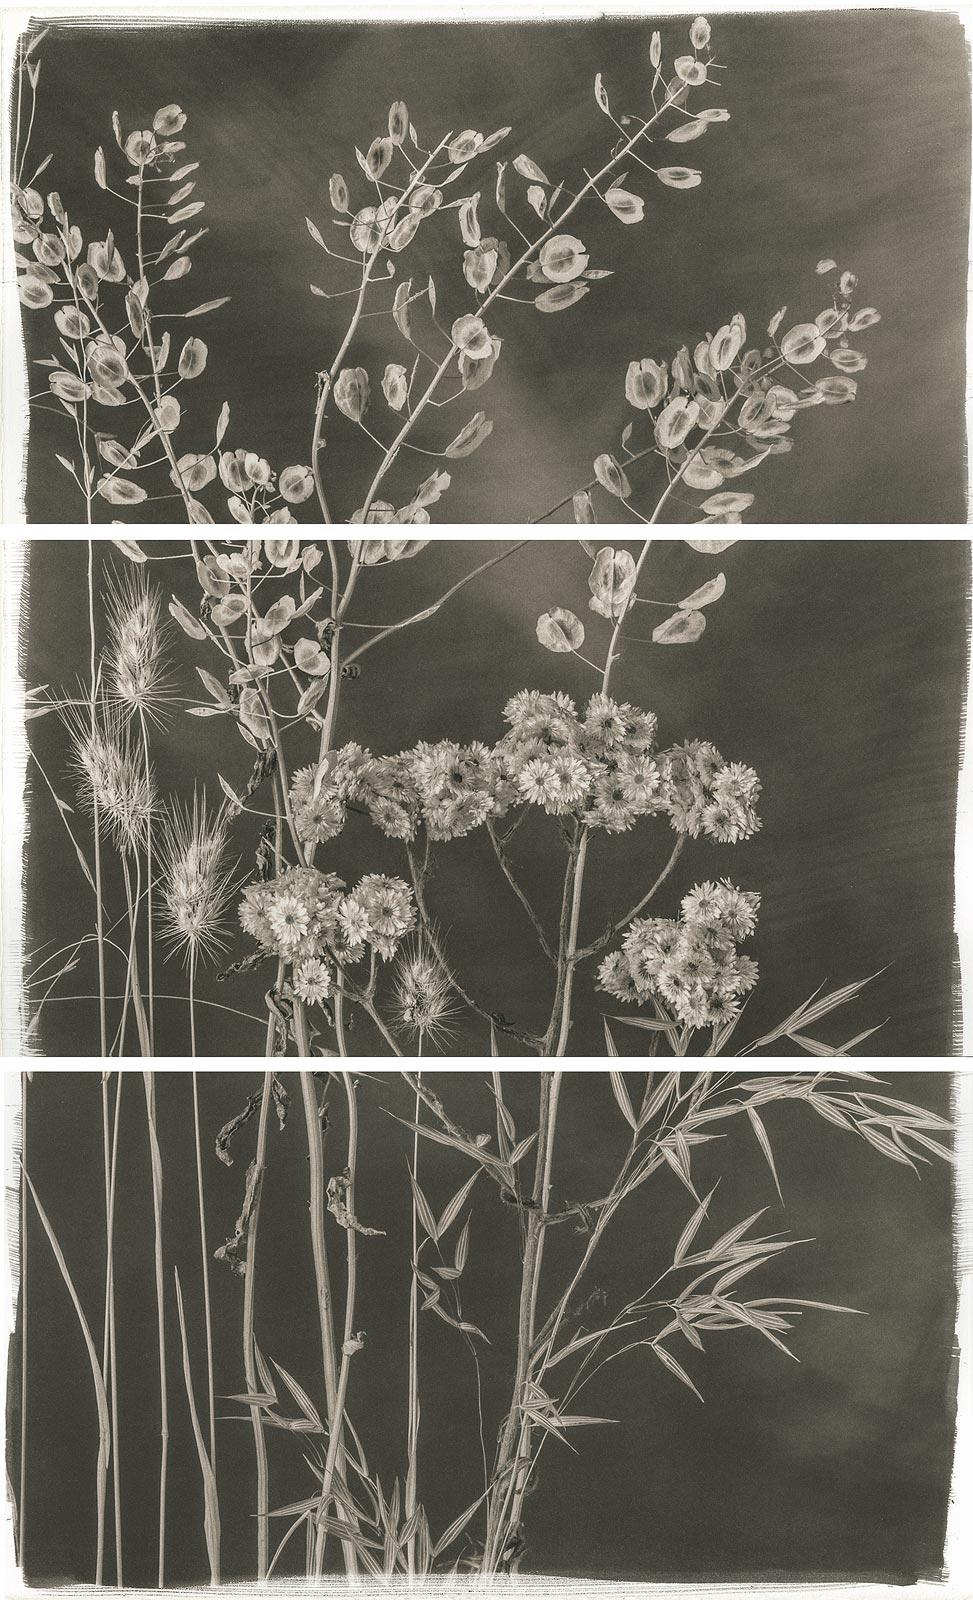 Carnochan, Valley Grasses V